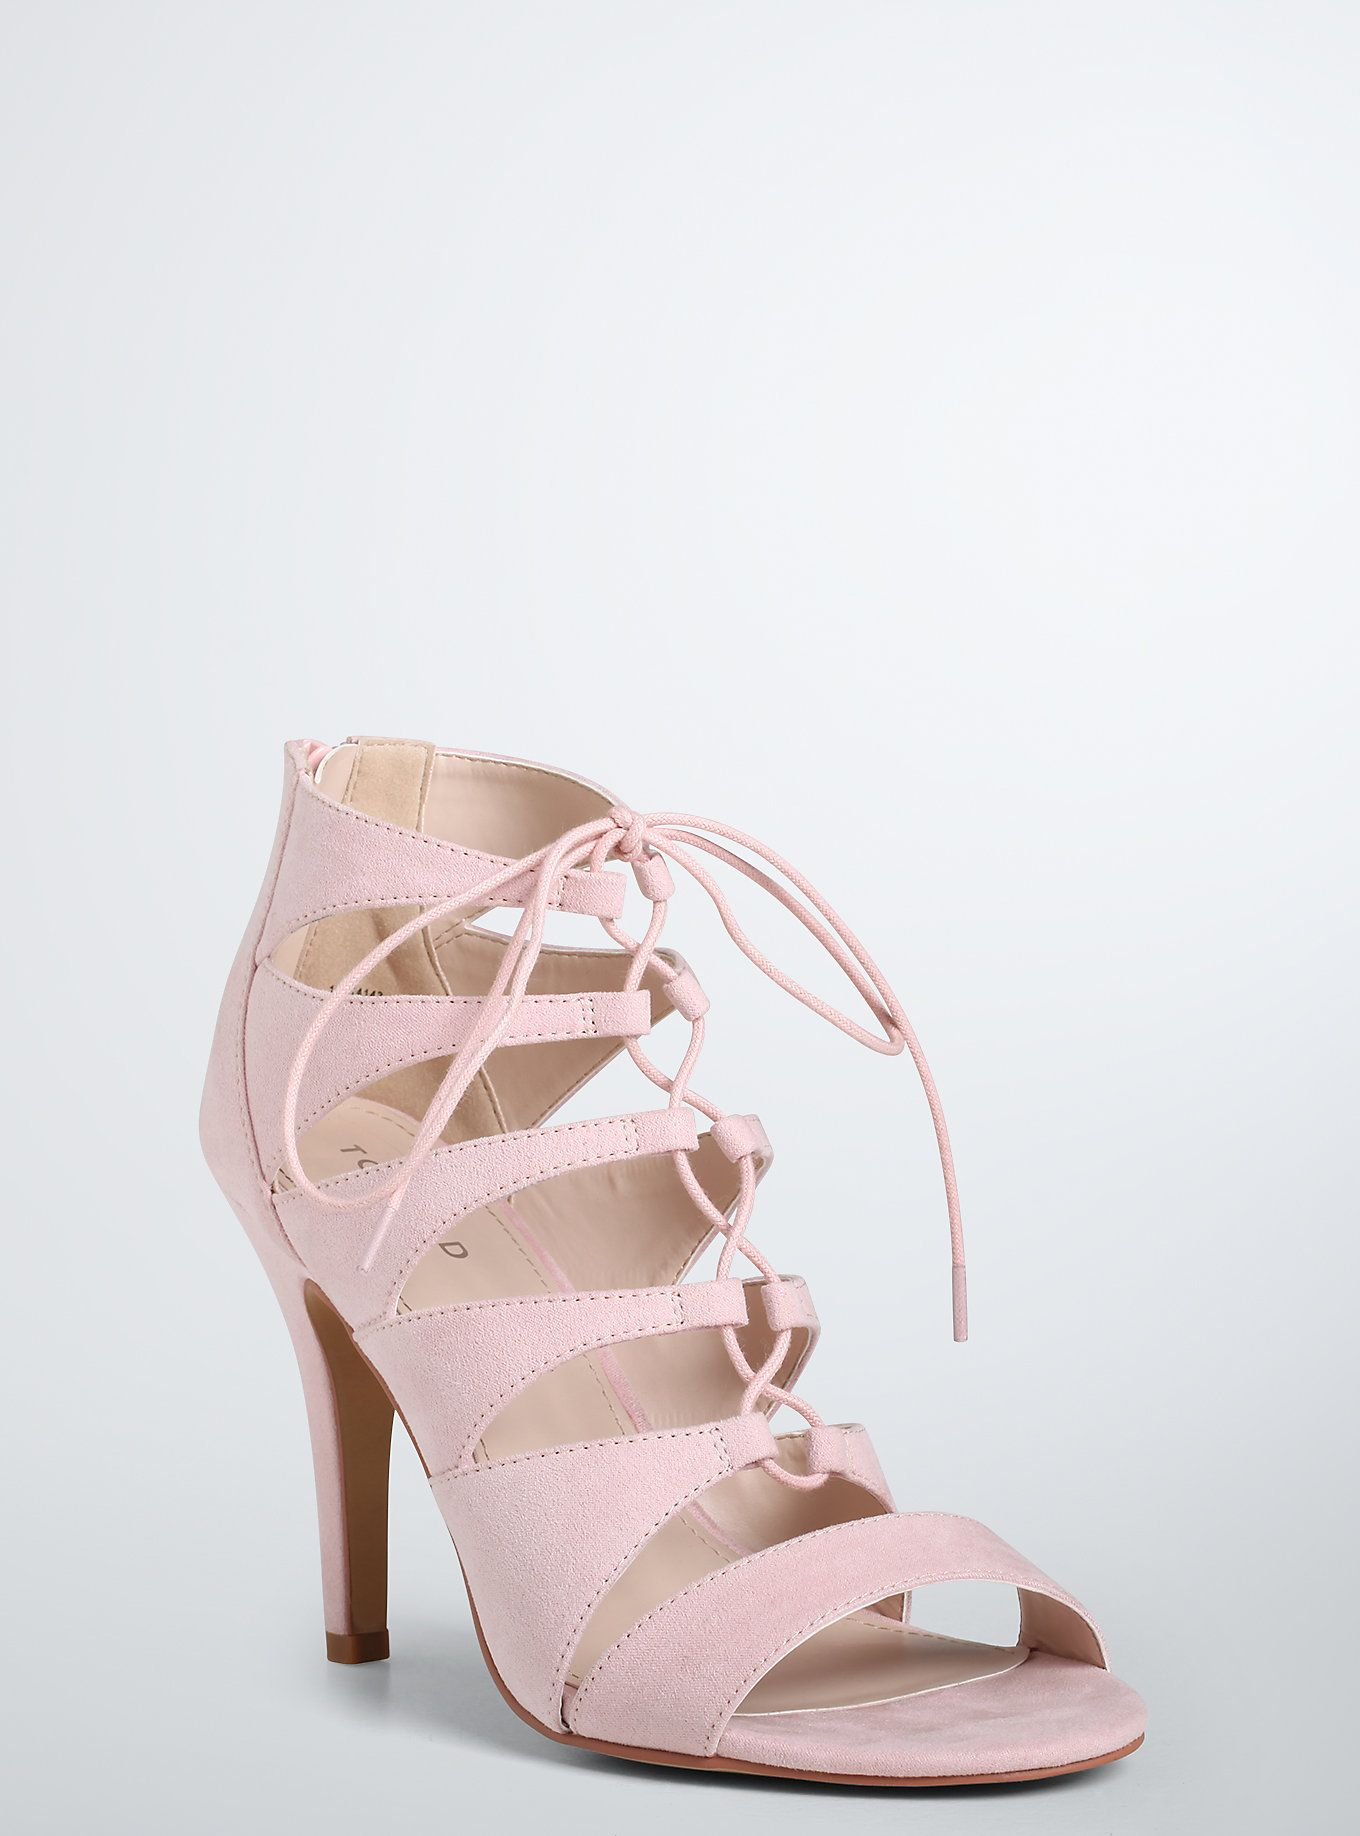 Lace Up Peep Toe Heels (Wide Width) | Torrid, Peep toe heels and Mauve